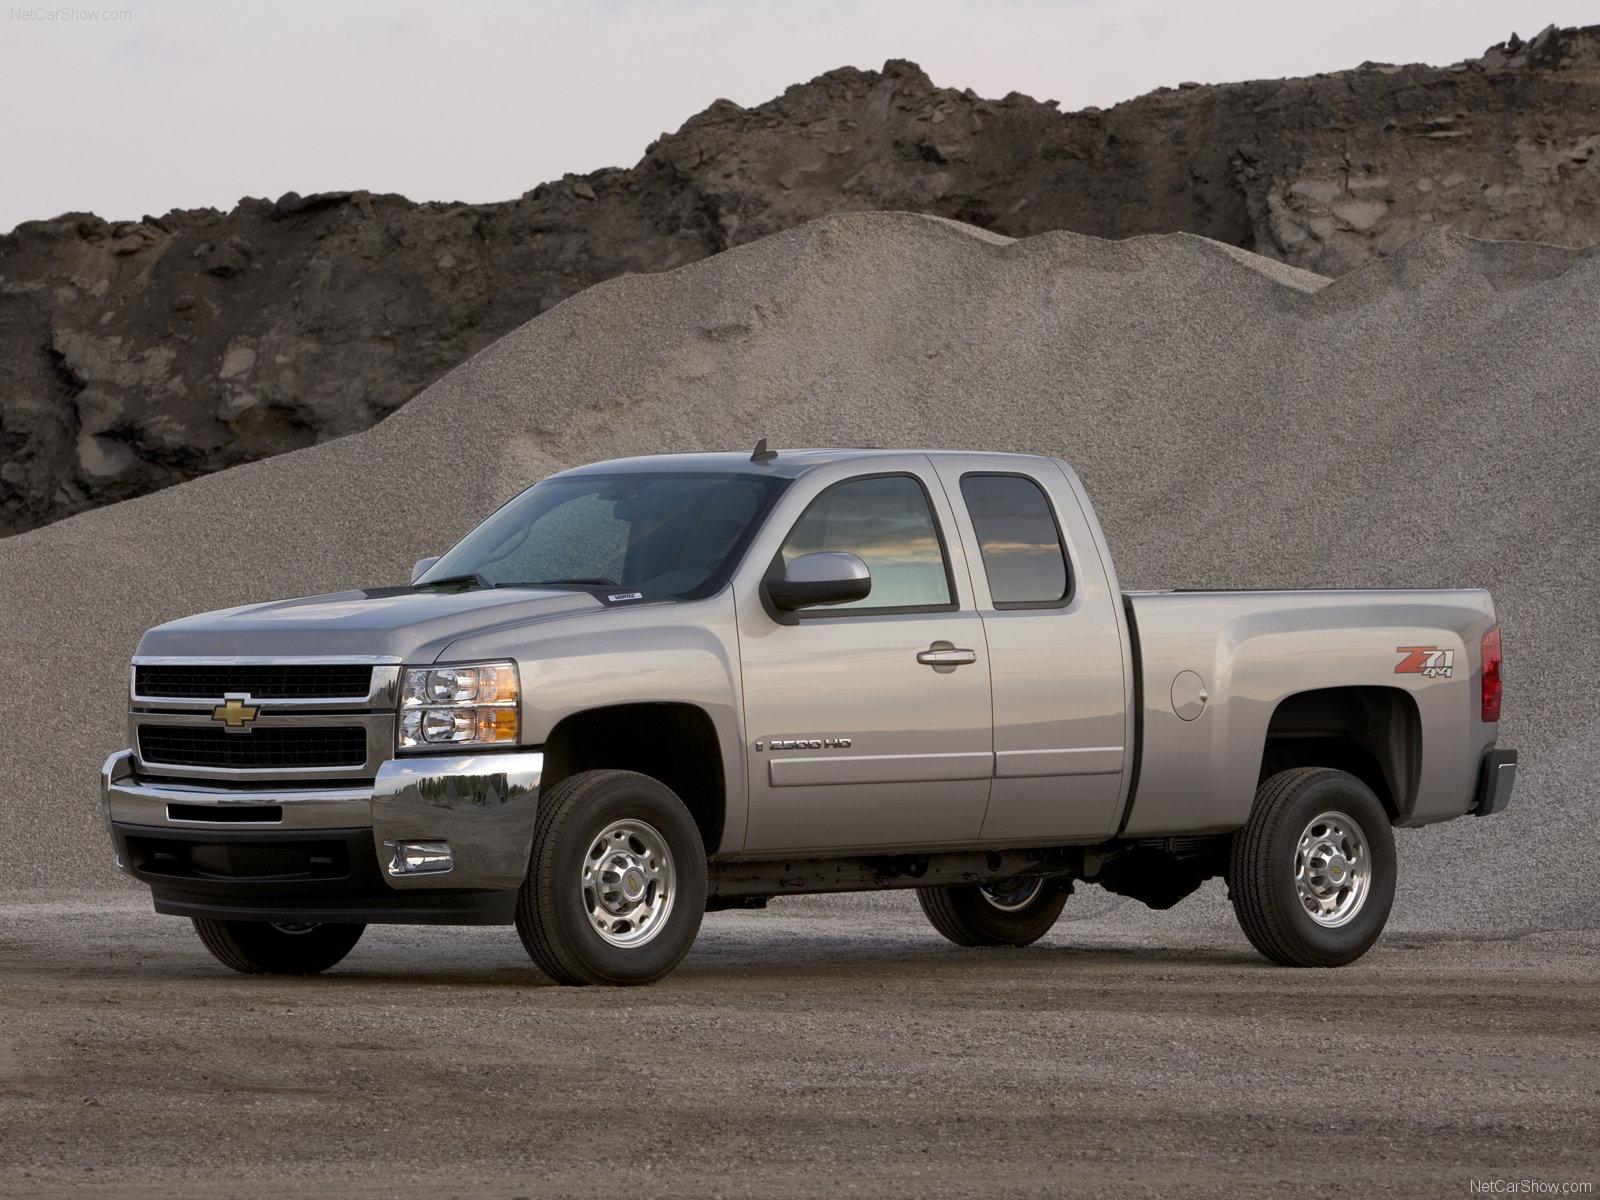 Chevrolet Silverado Extended Cab photos Gallery with 26 pics